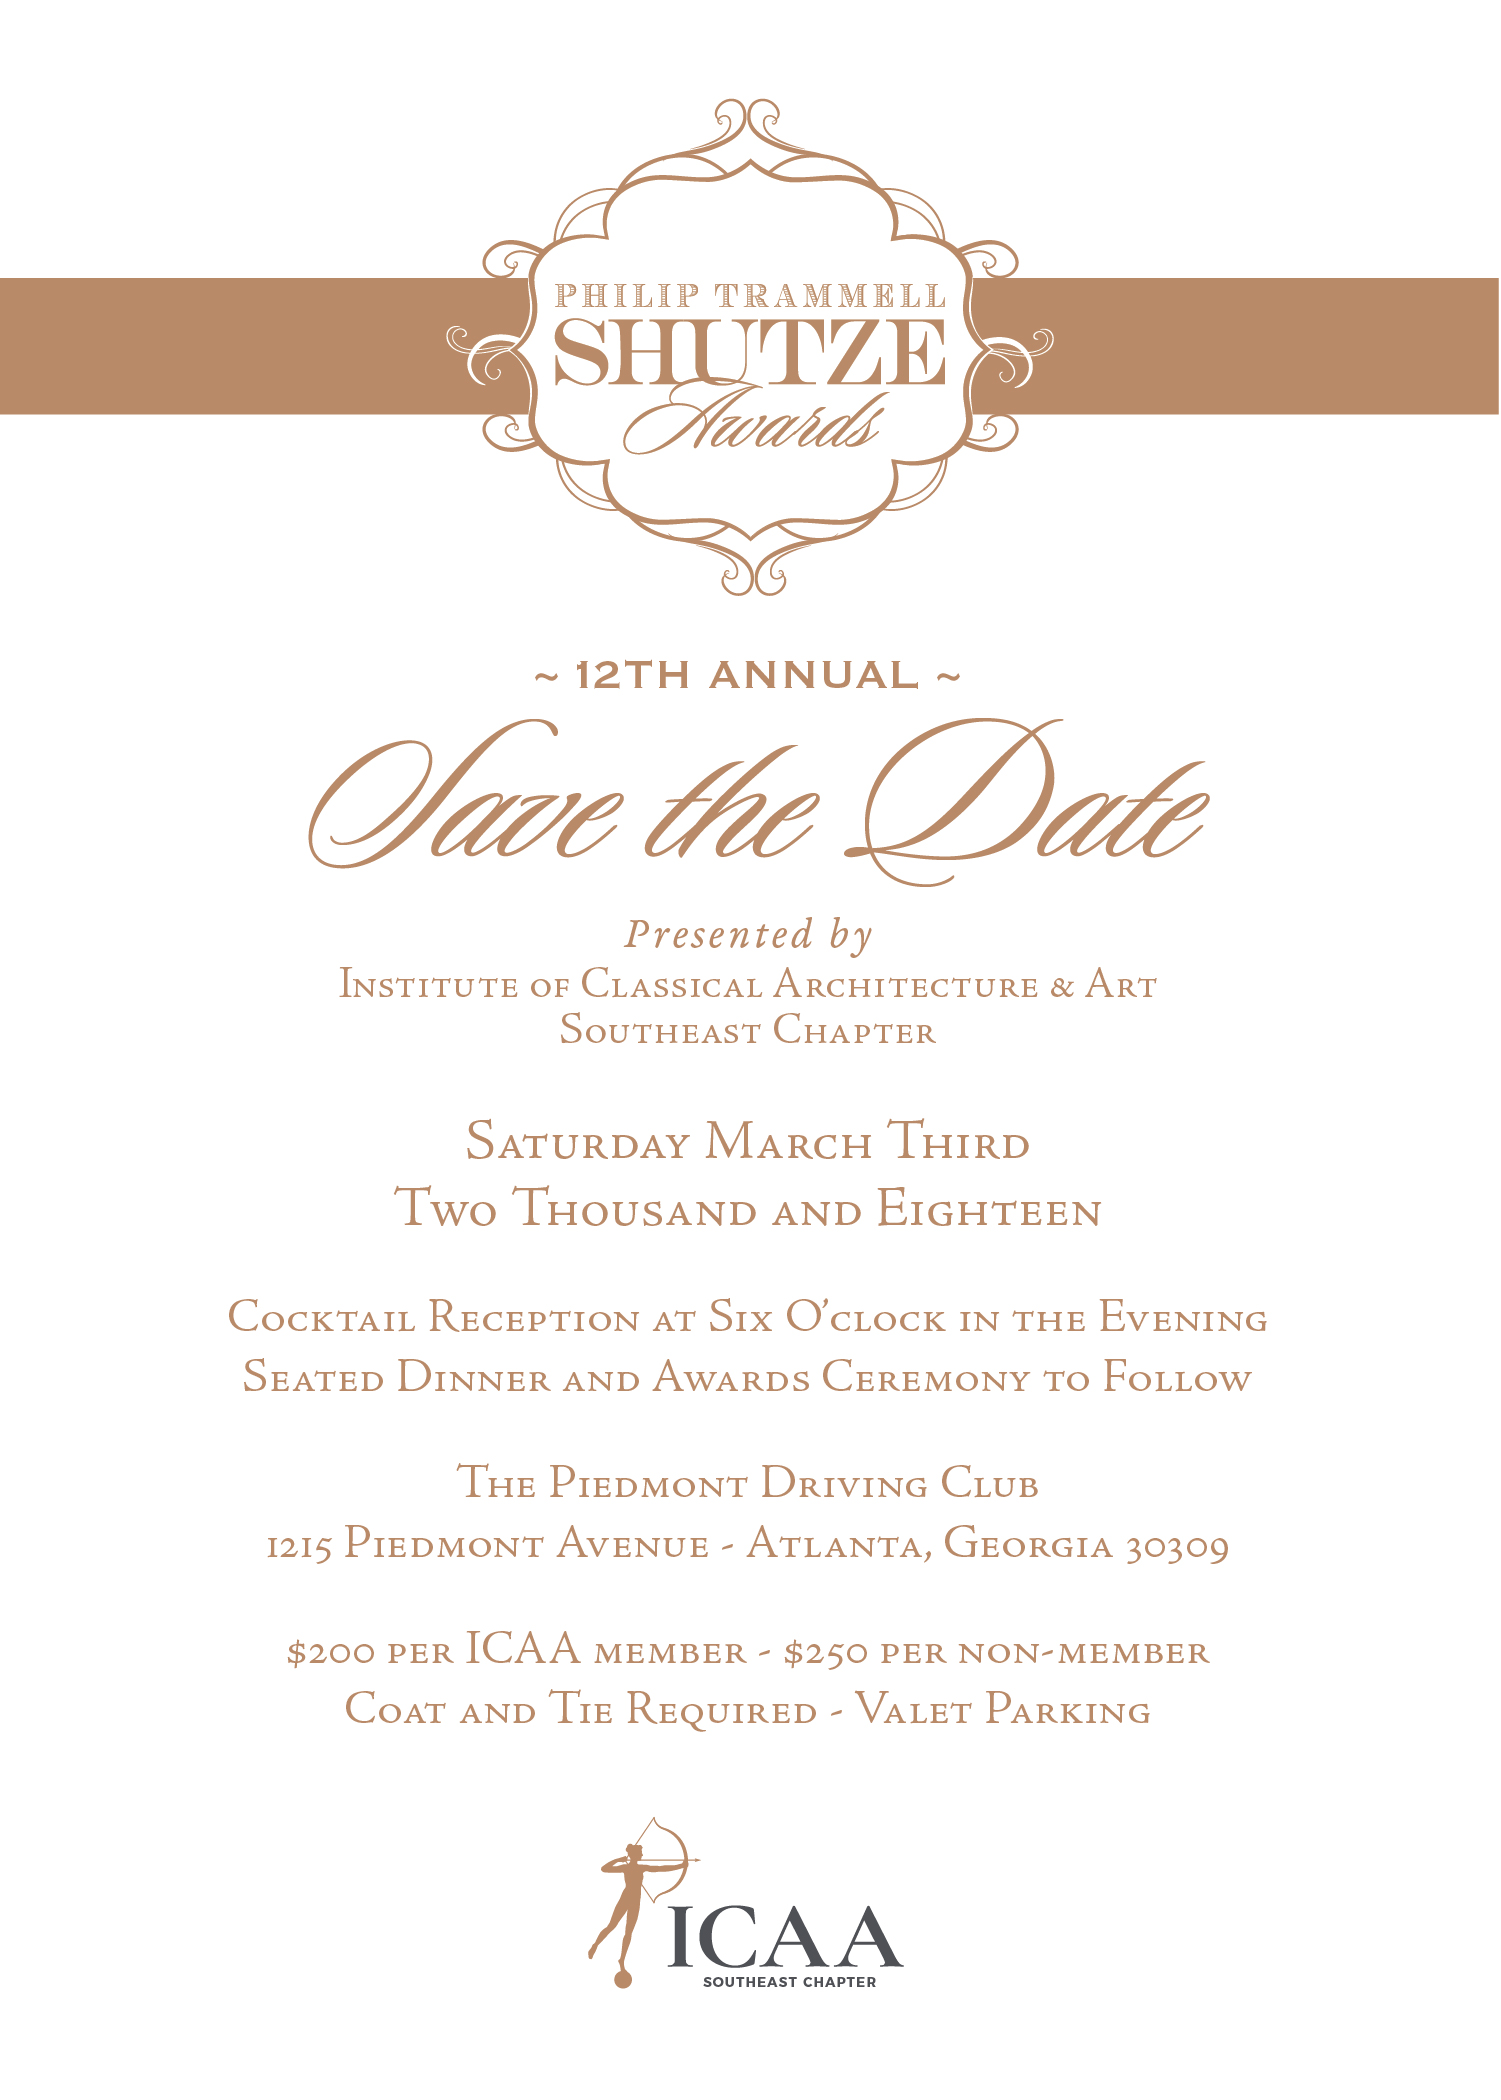 2018 Shutze Save the Date-01